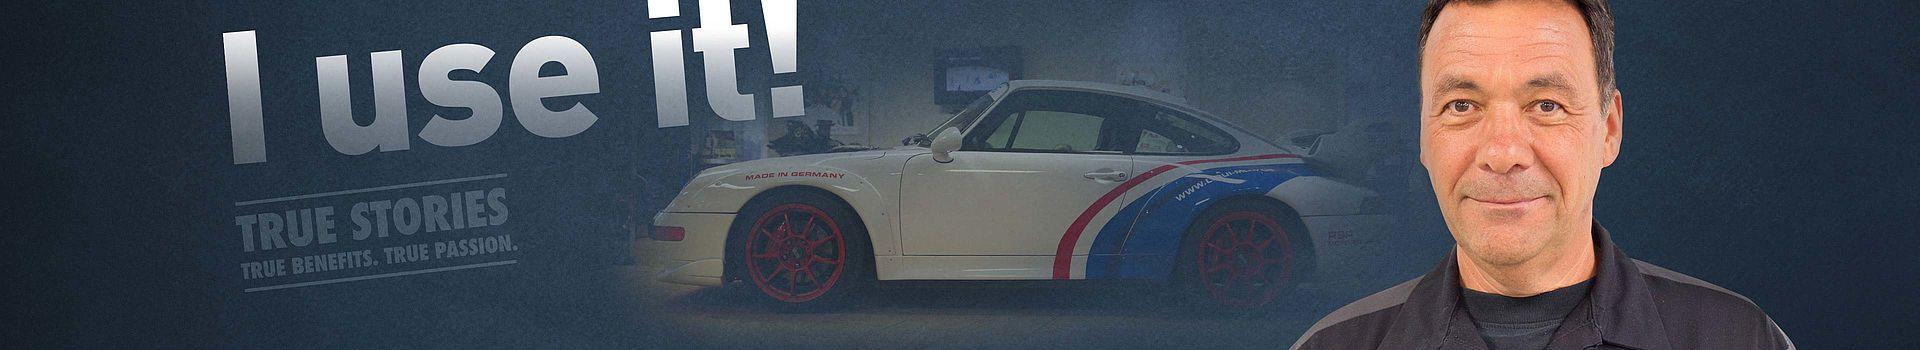 Porsche specialist, workshop owner and LIQUI MOLY testimonial. RSP-Motorsports Inc